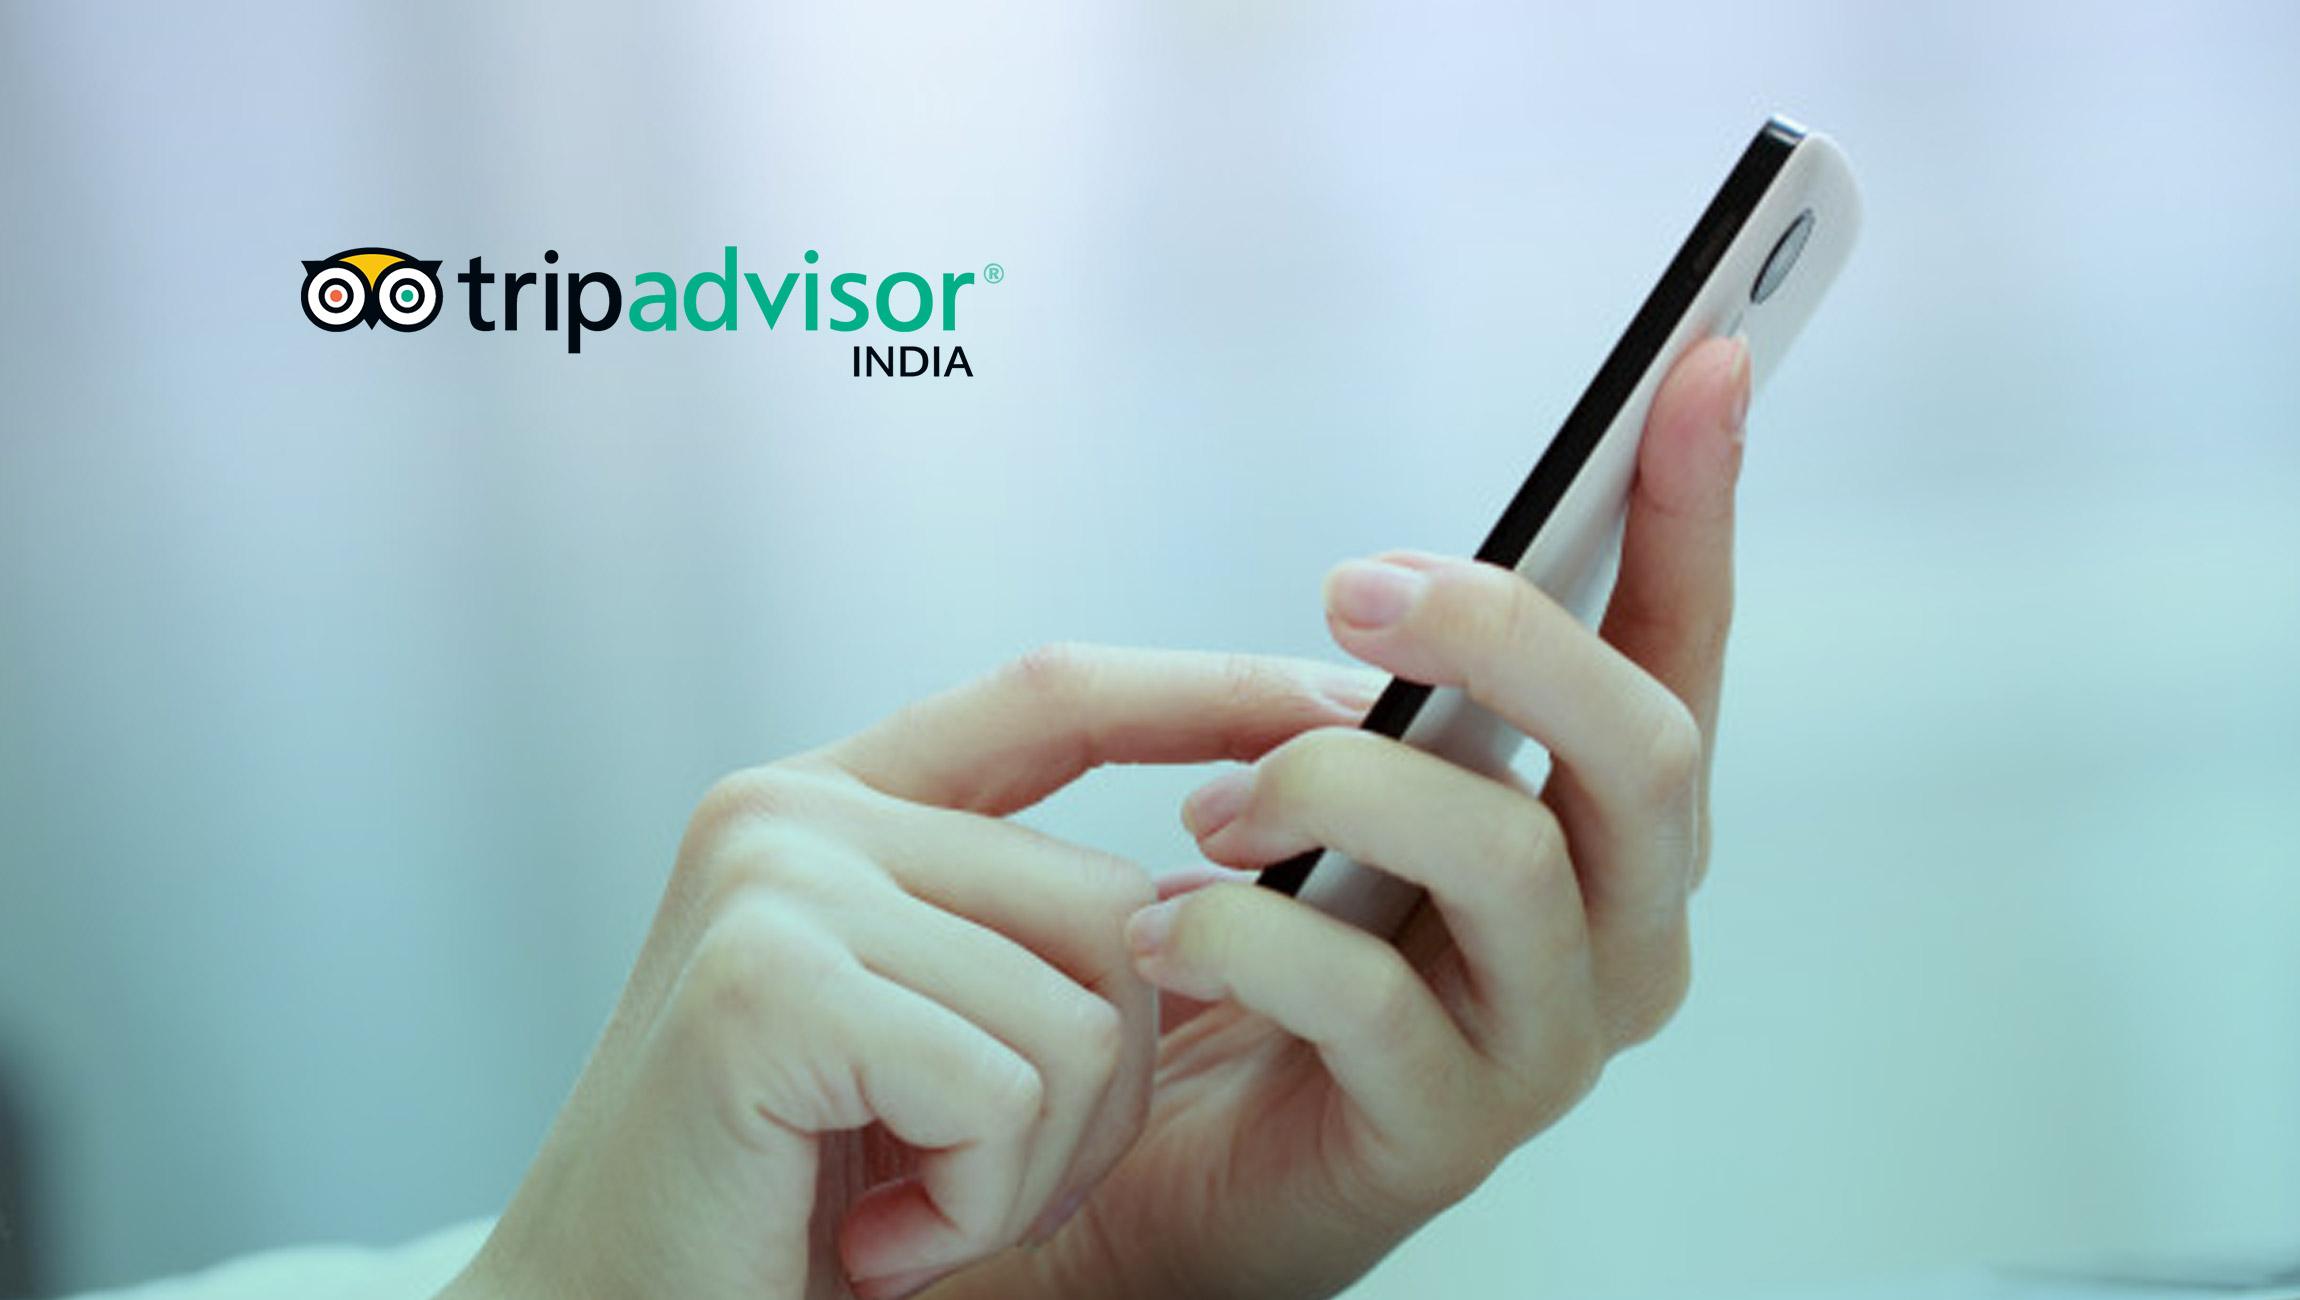 Utilizing Tripadvisor's New Proprietary First-Party Data Platform, Tripadvisor Navigator, Abu Dhabi (DCT Abu Dhabi) Partners With Tripadvisor in Launching New Campaign to Drive Traveler Inspiration and High Return on Advertising Spend  -